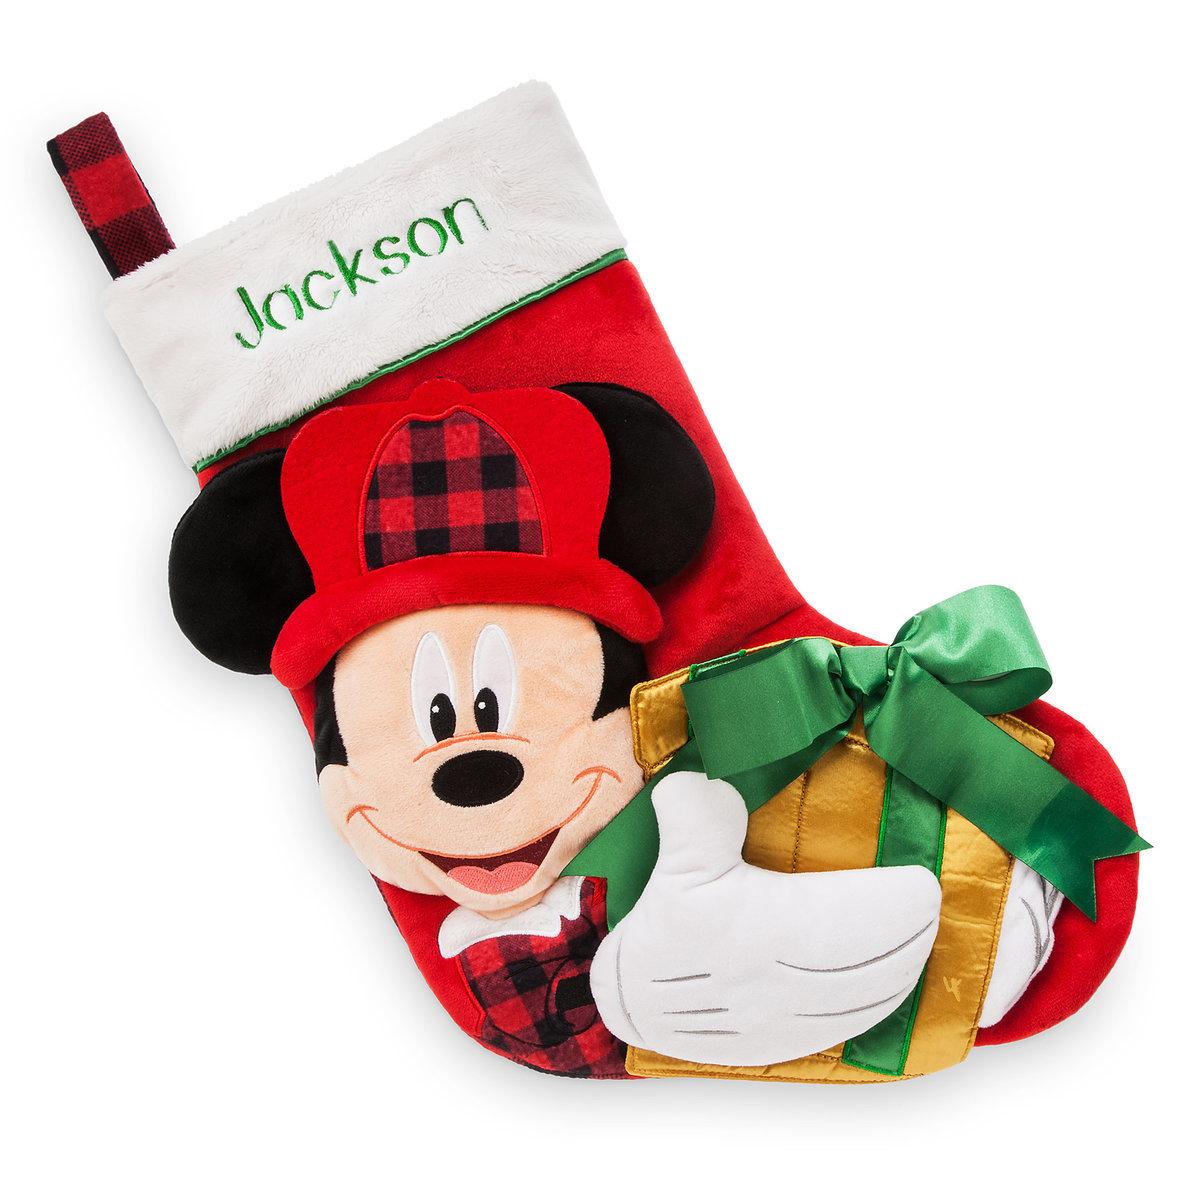 disney christmas holiday stocking mickey mouse plush holiday 2017 - Mickey Mouse Christmas Stocking